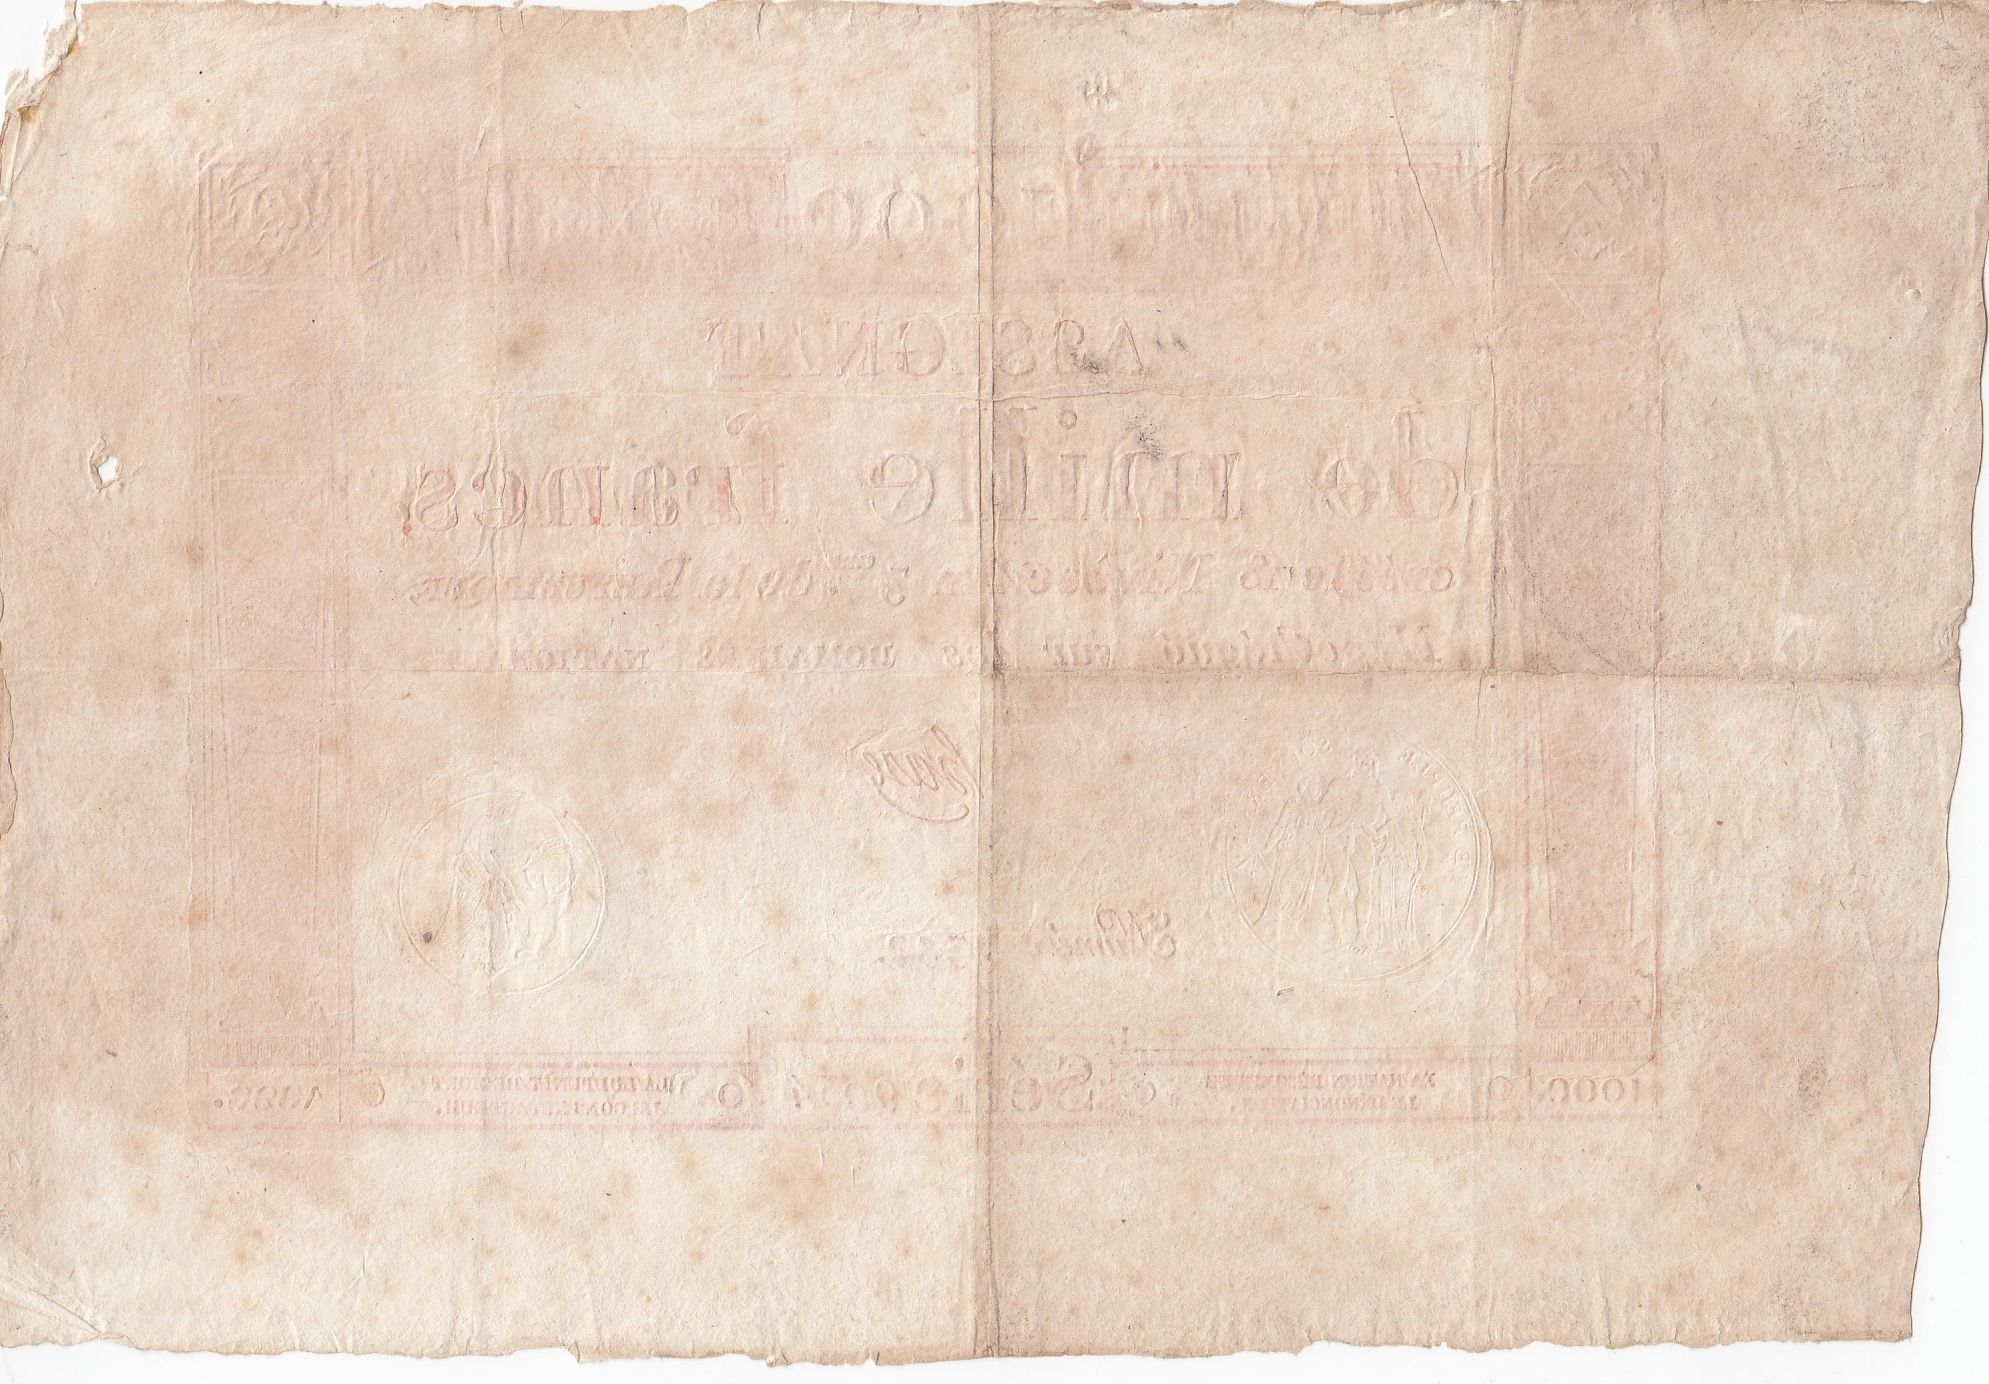 France 1000 Francs 18 Nivose An III - 7.1.1795 - Sign. Haze - VF